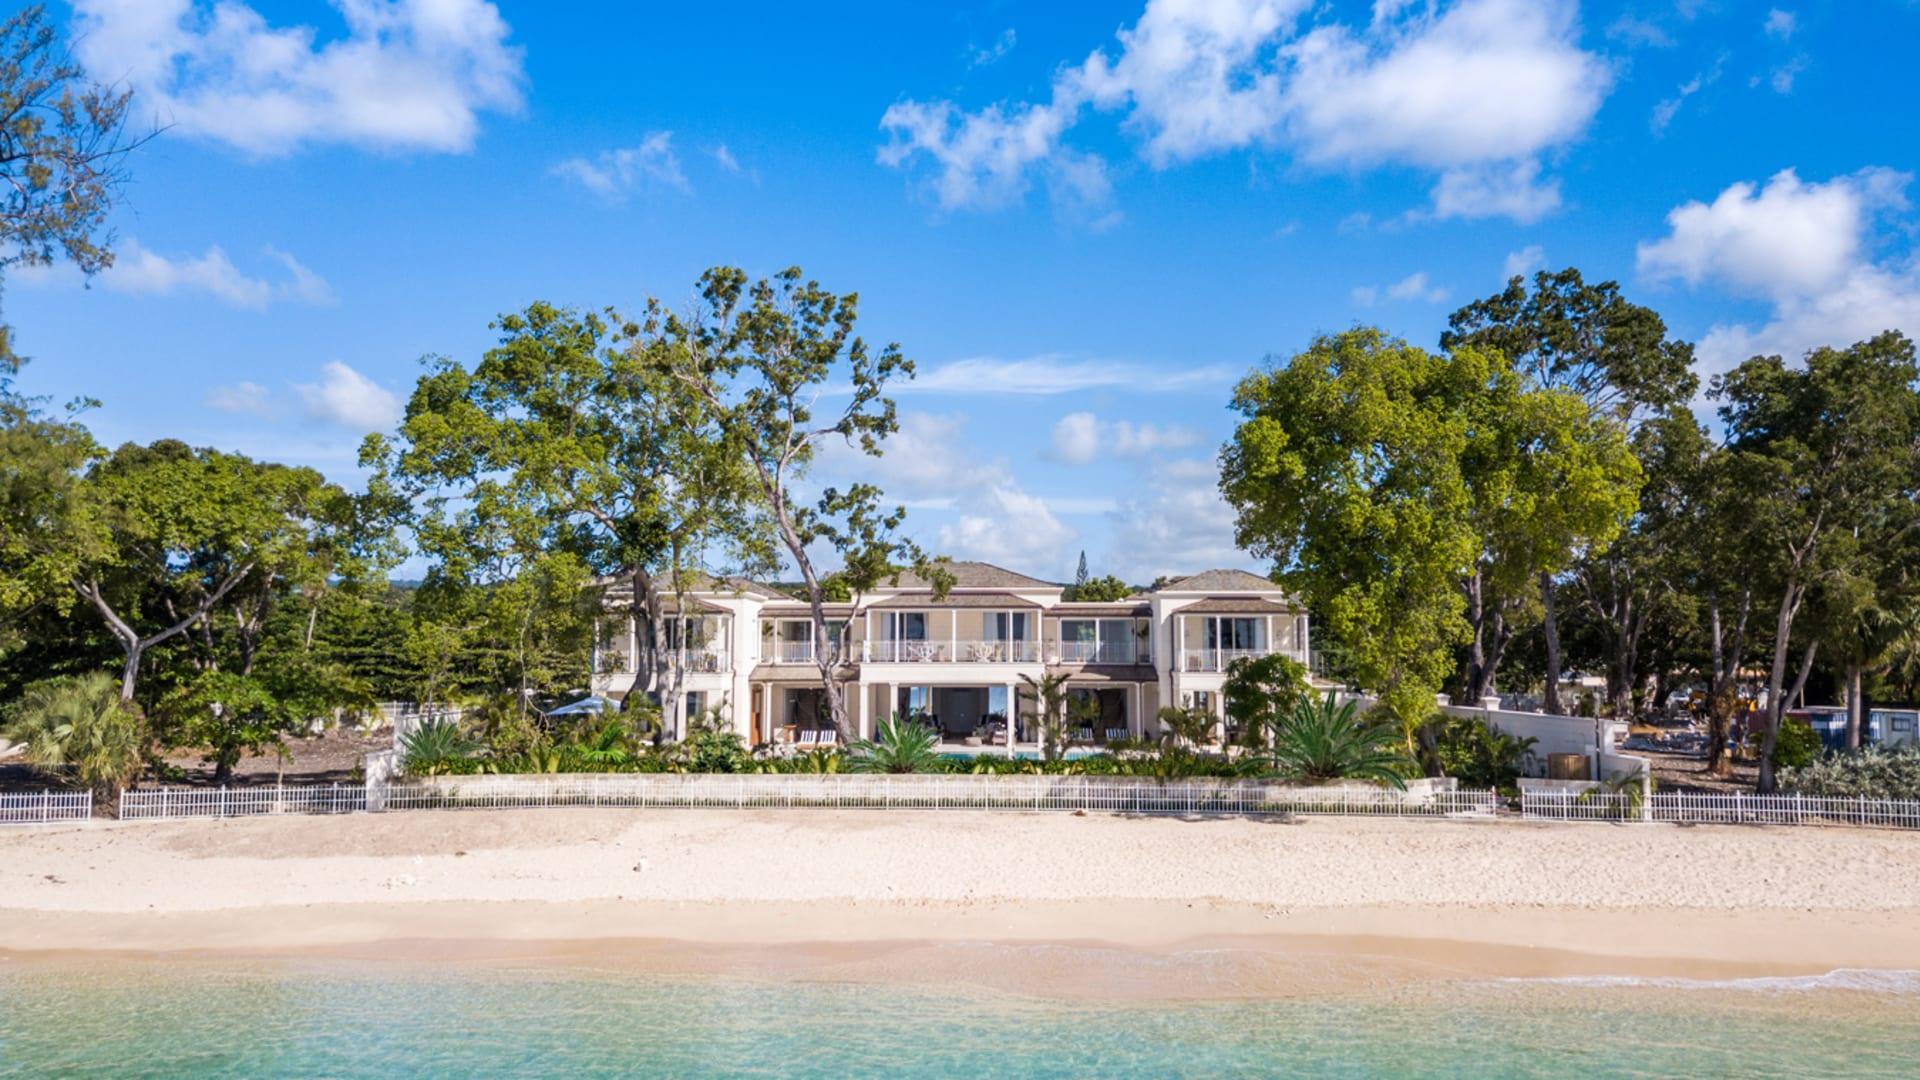 Villa Tamarindo from the sea